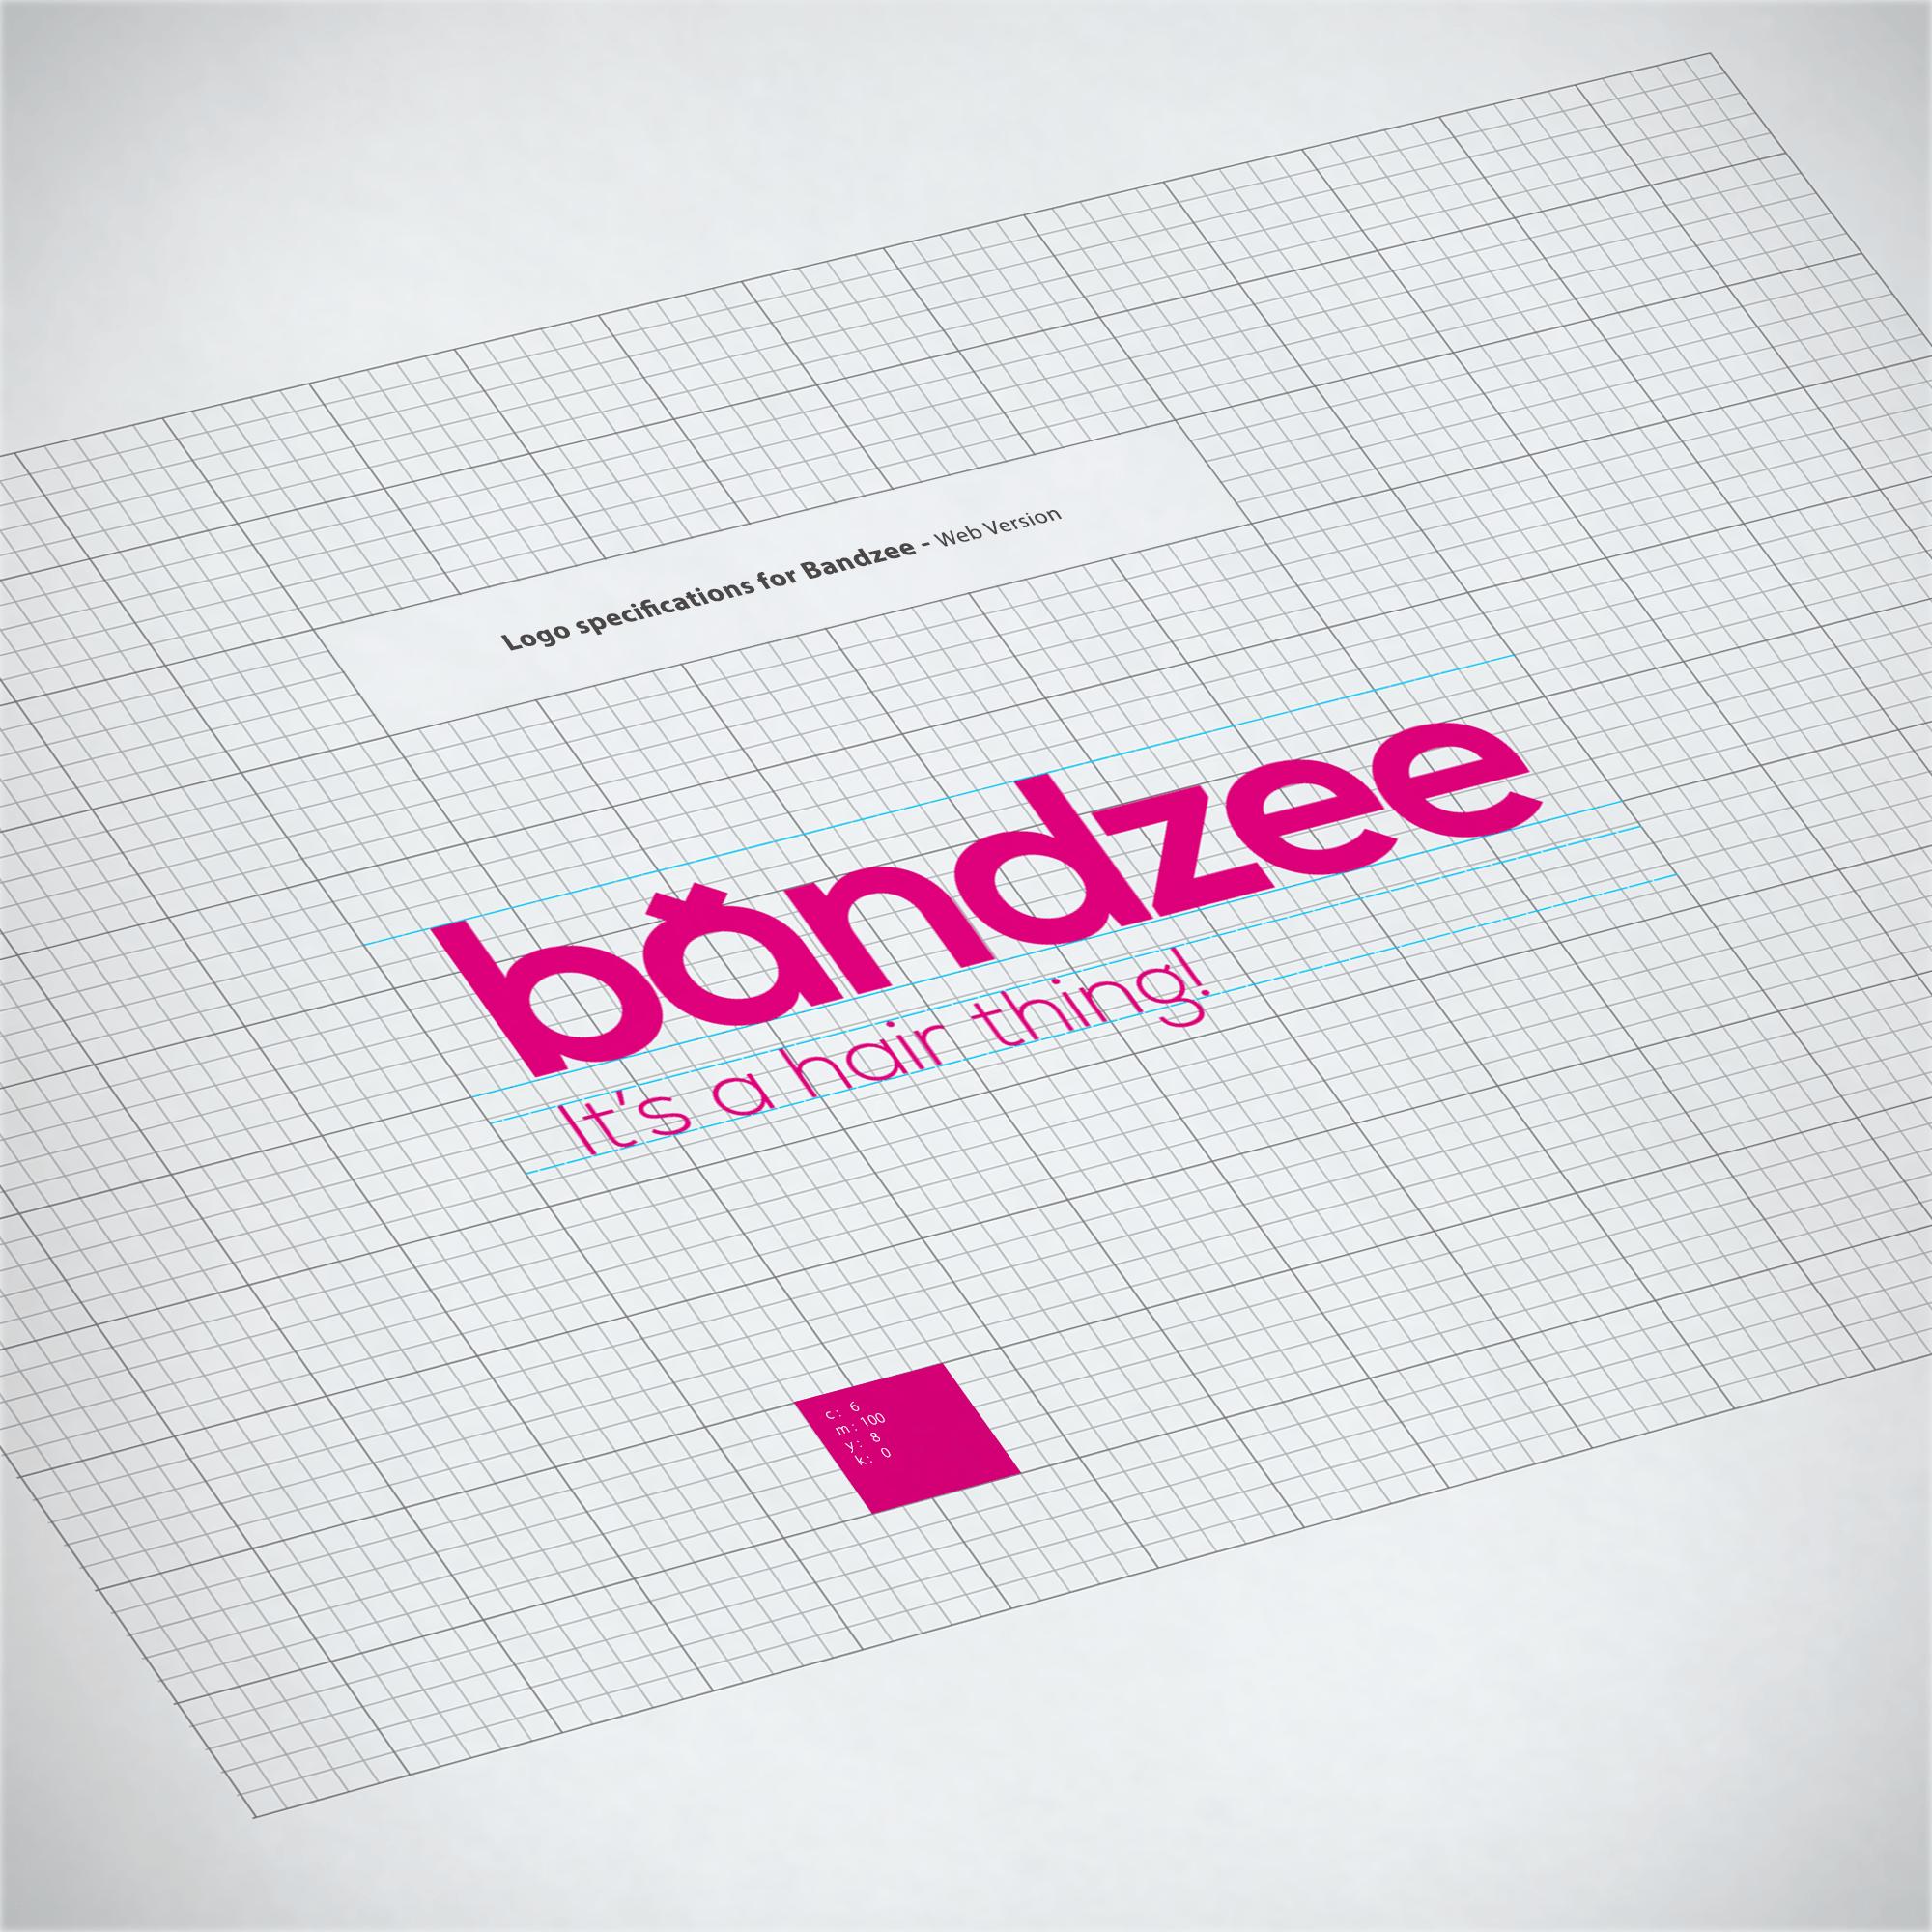 Design & Branding Process.